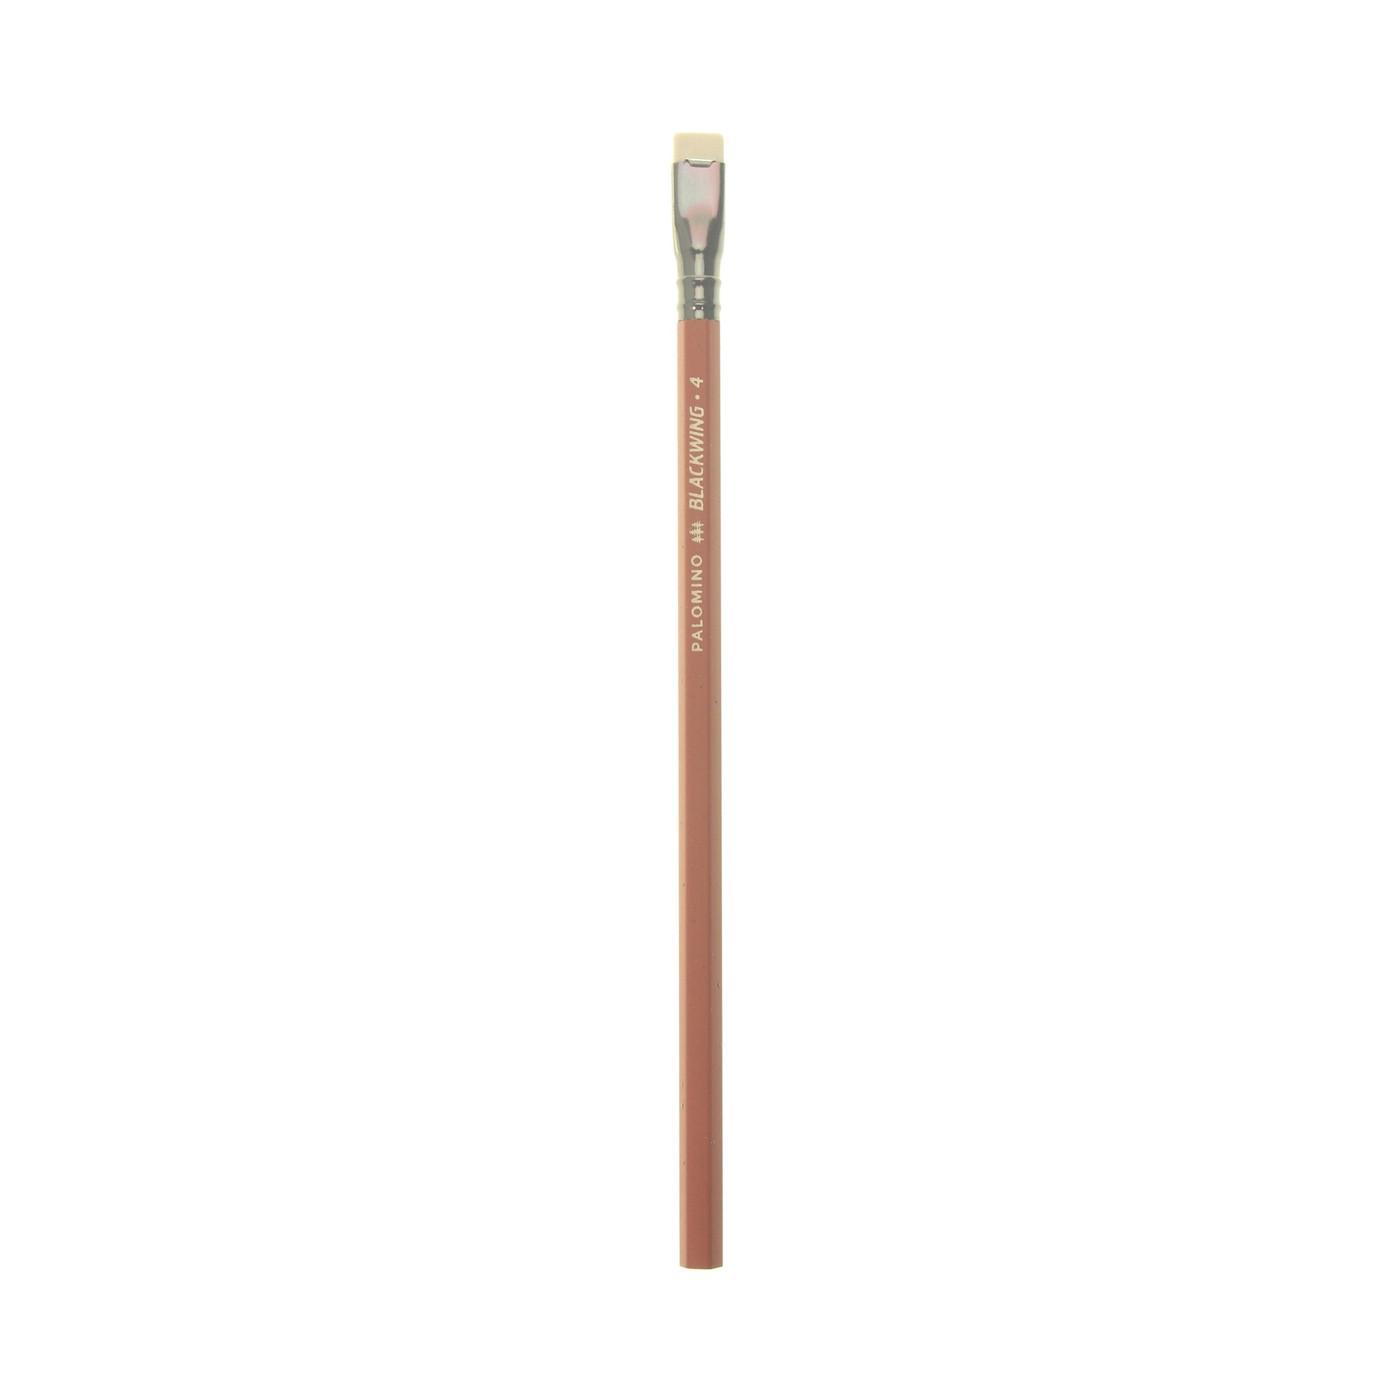 Blackwing pencil - Volume 4 (soft)